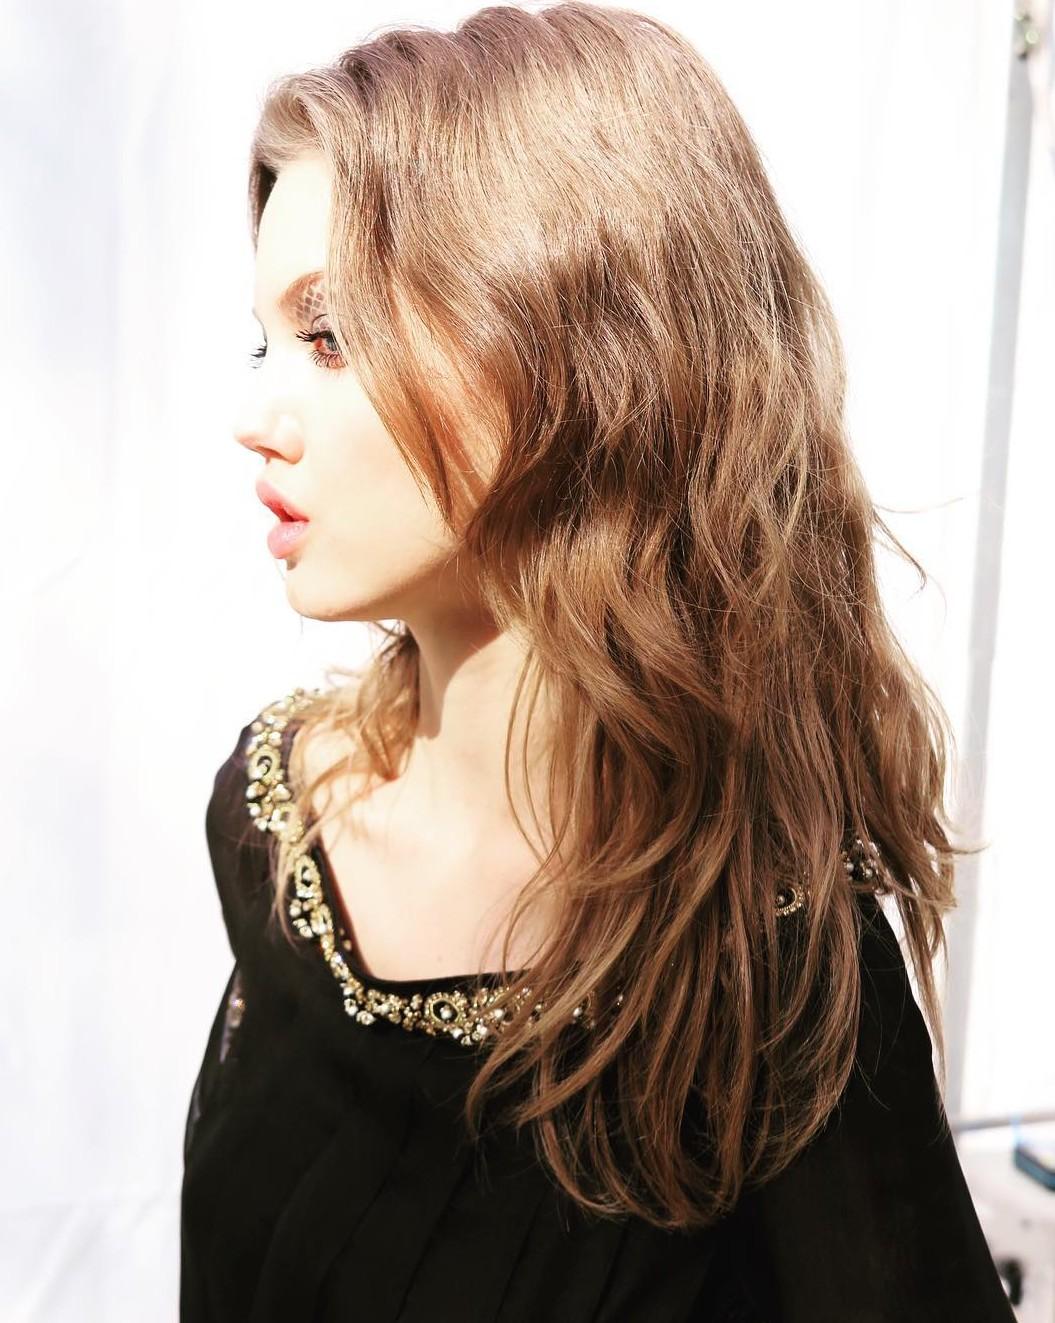 Chanel AW 2016   Model: Lindsey Wixson   Hair: Sam McKnight  